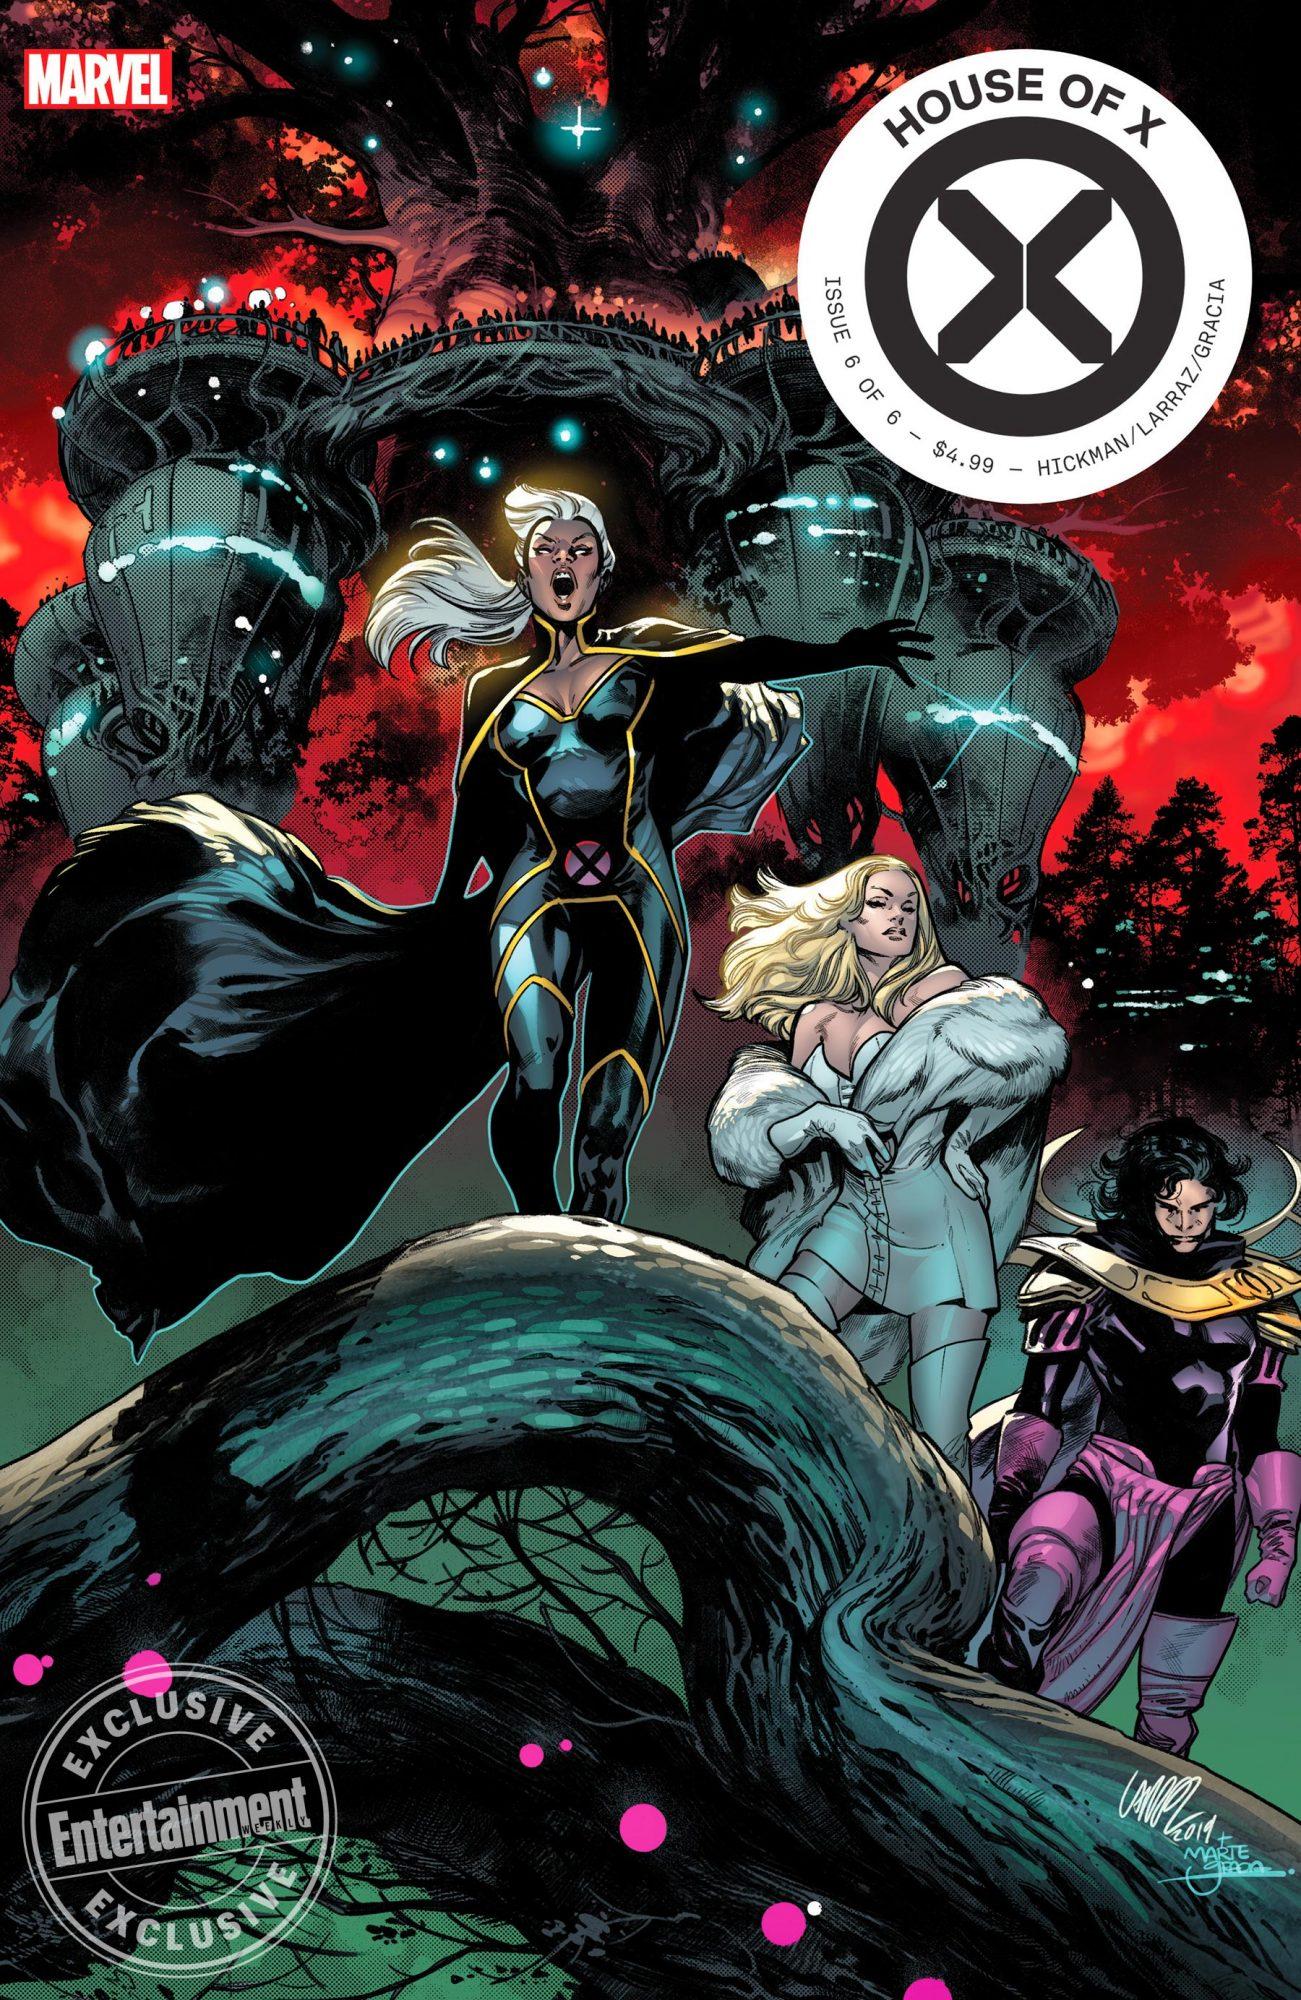 House of X (X-Men) #6 Comic Book